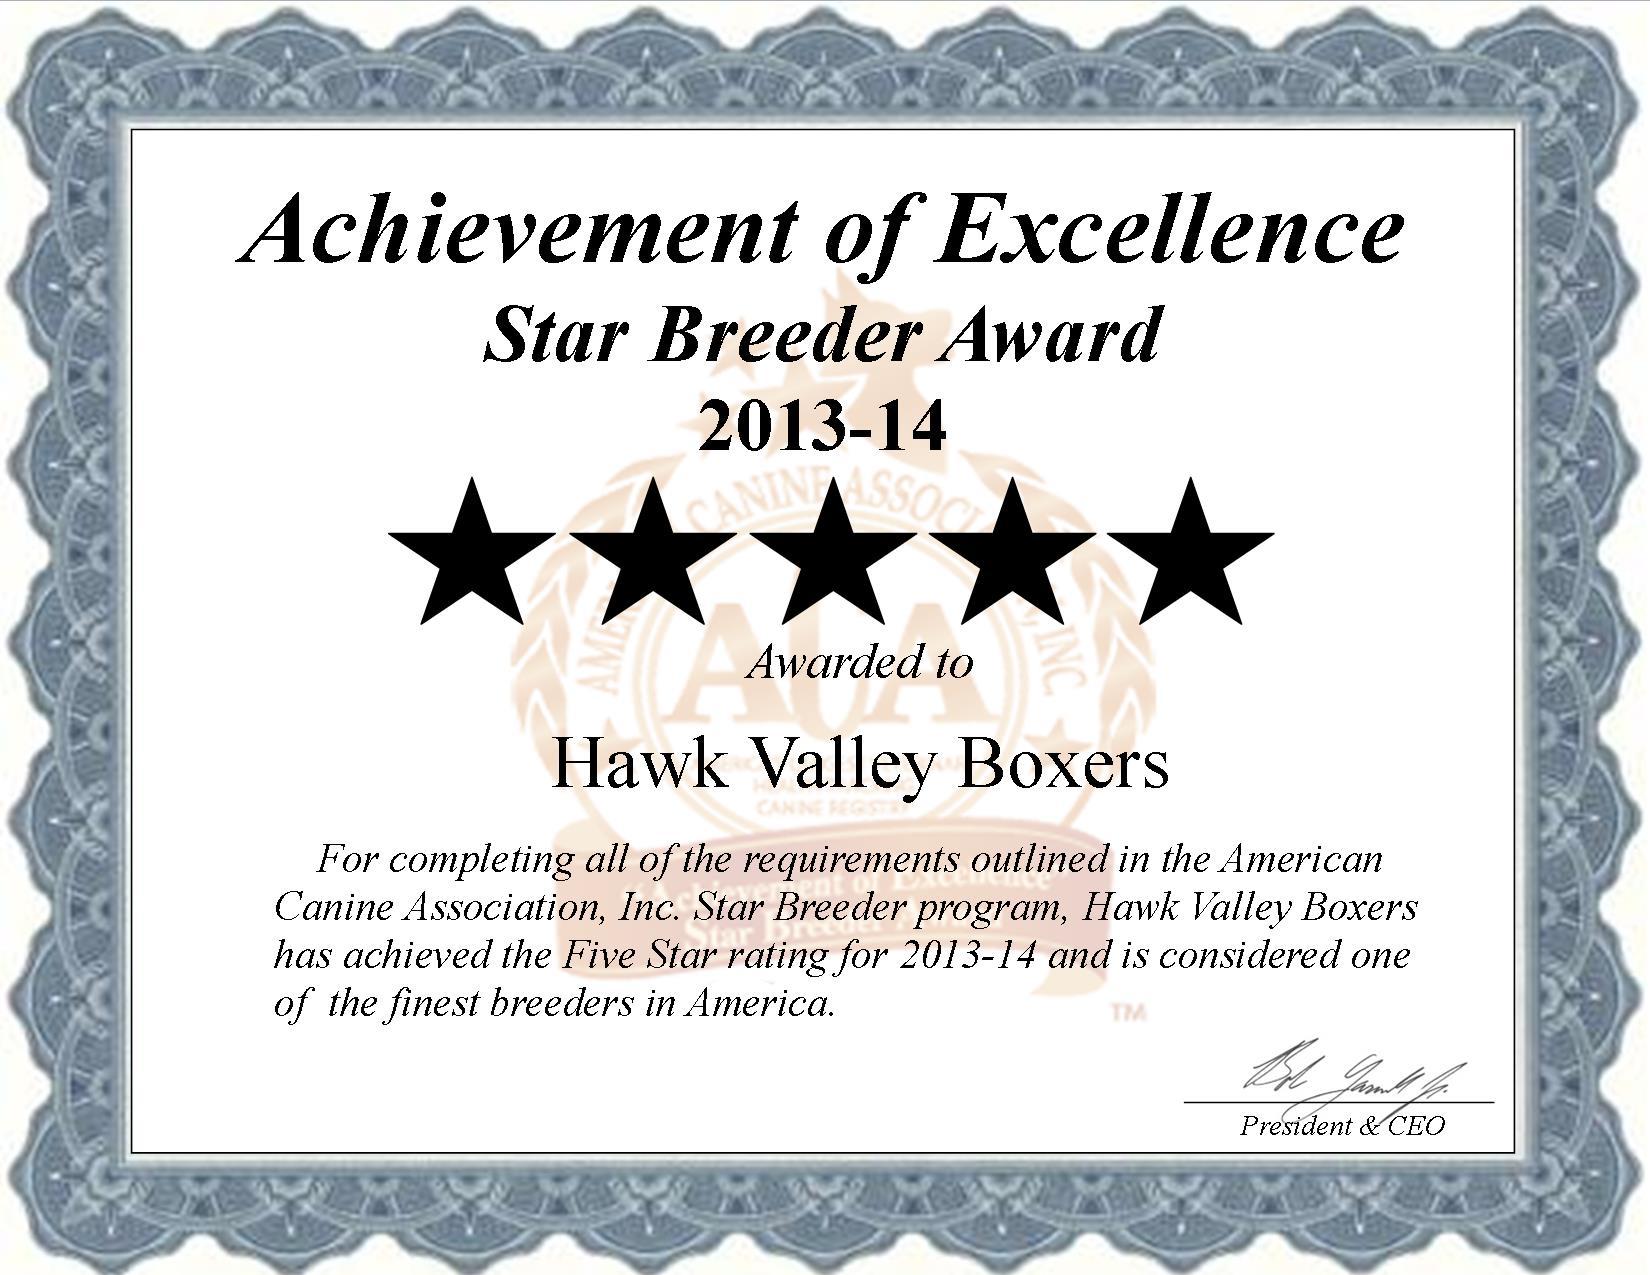 Hawk Valley Boxers Star Breeder Certificate